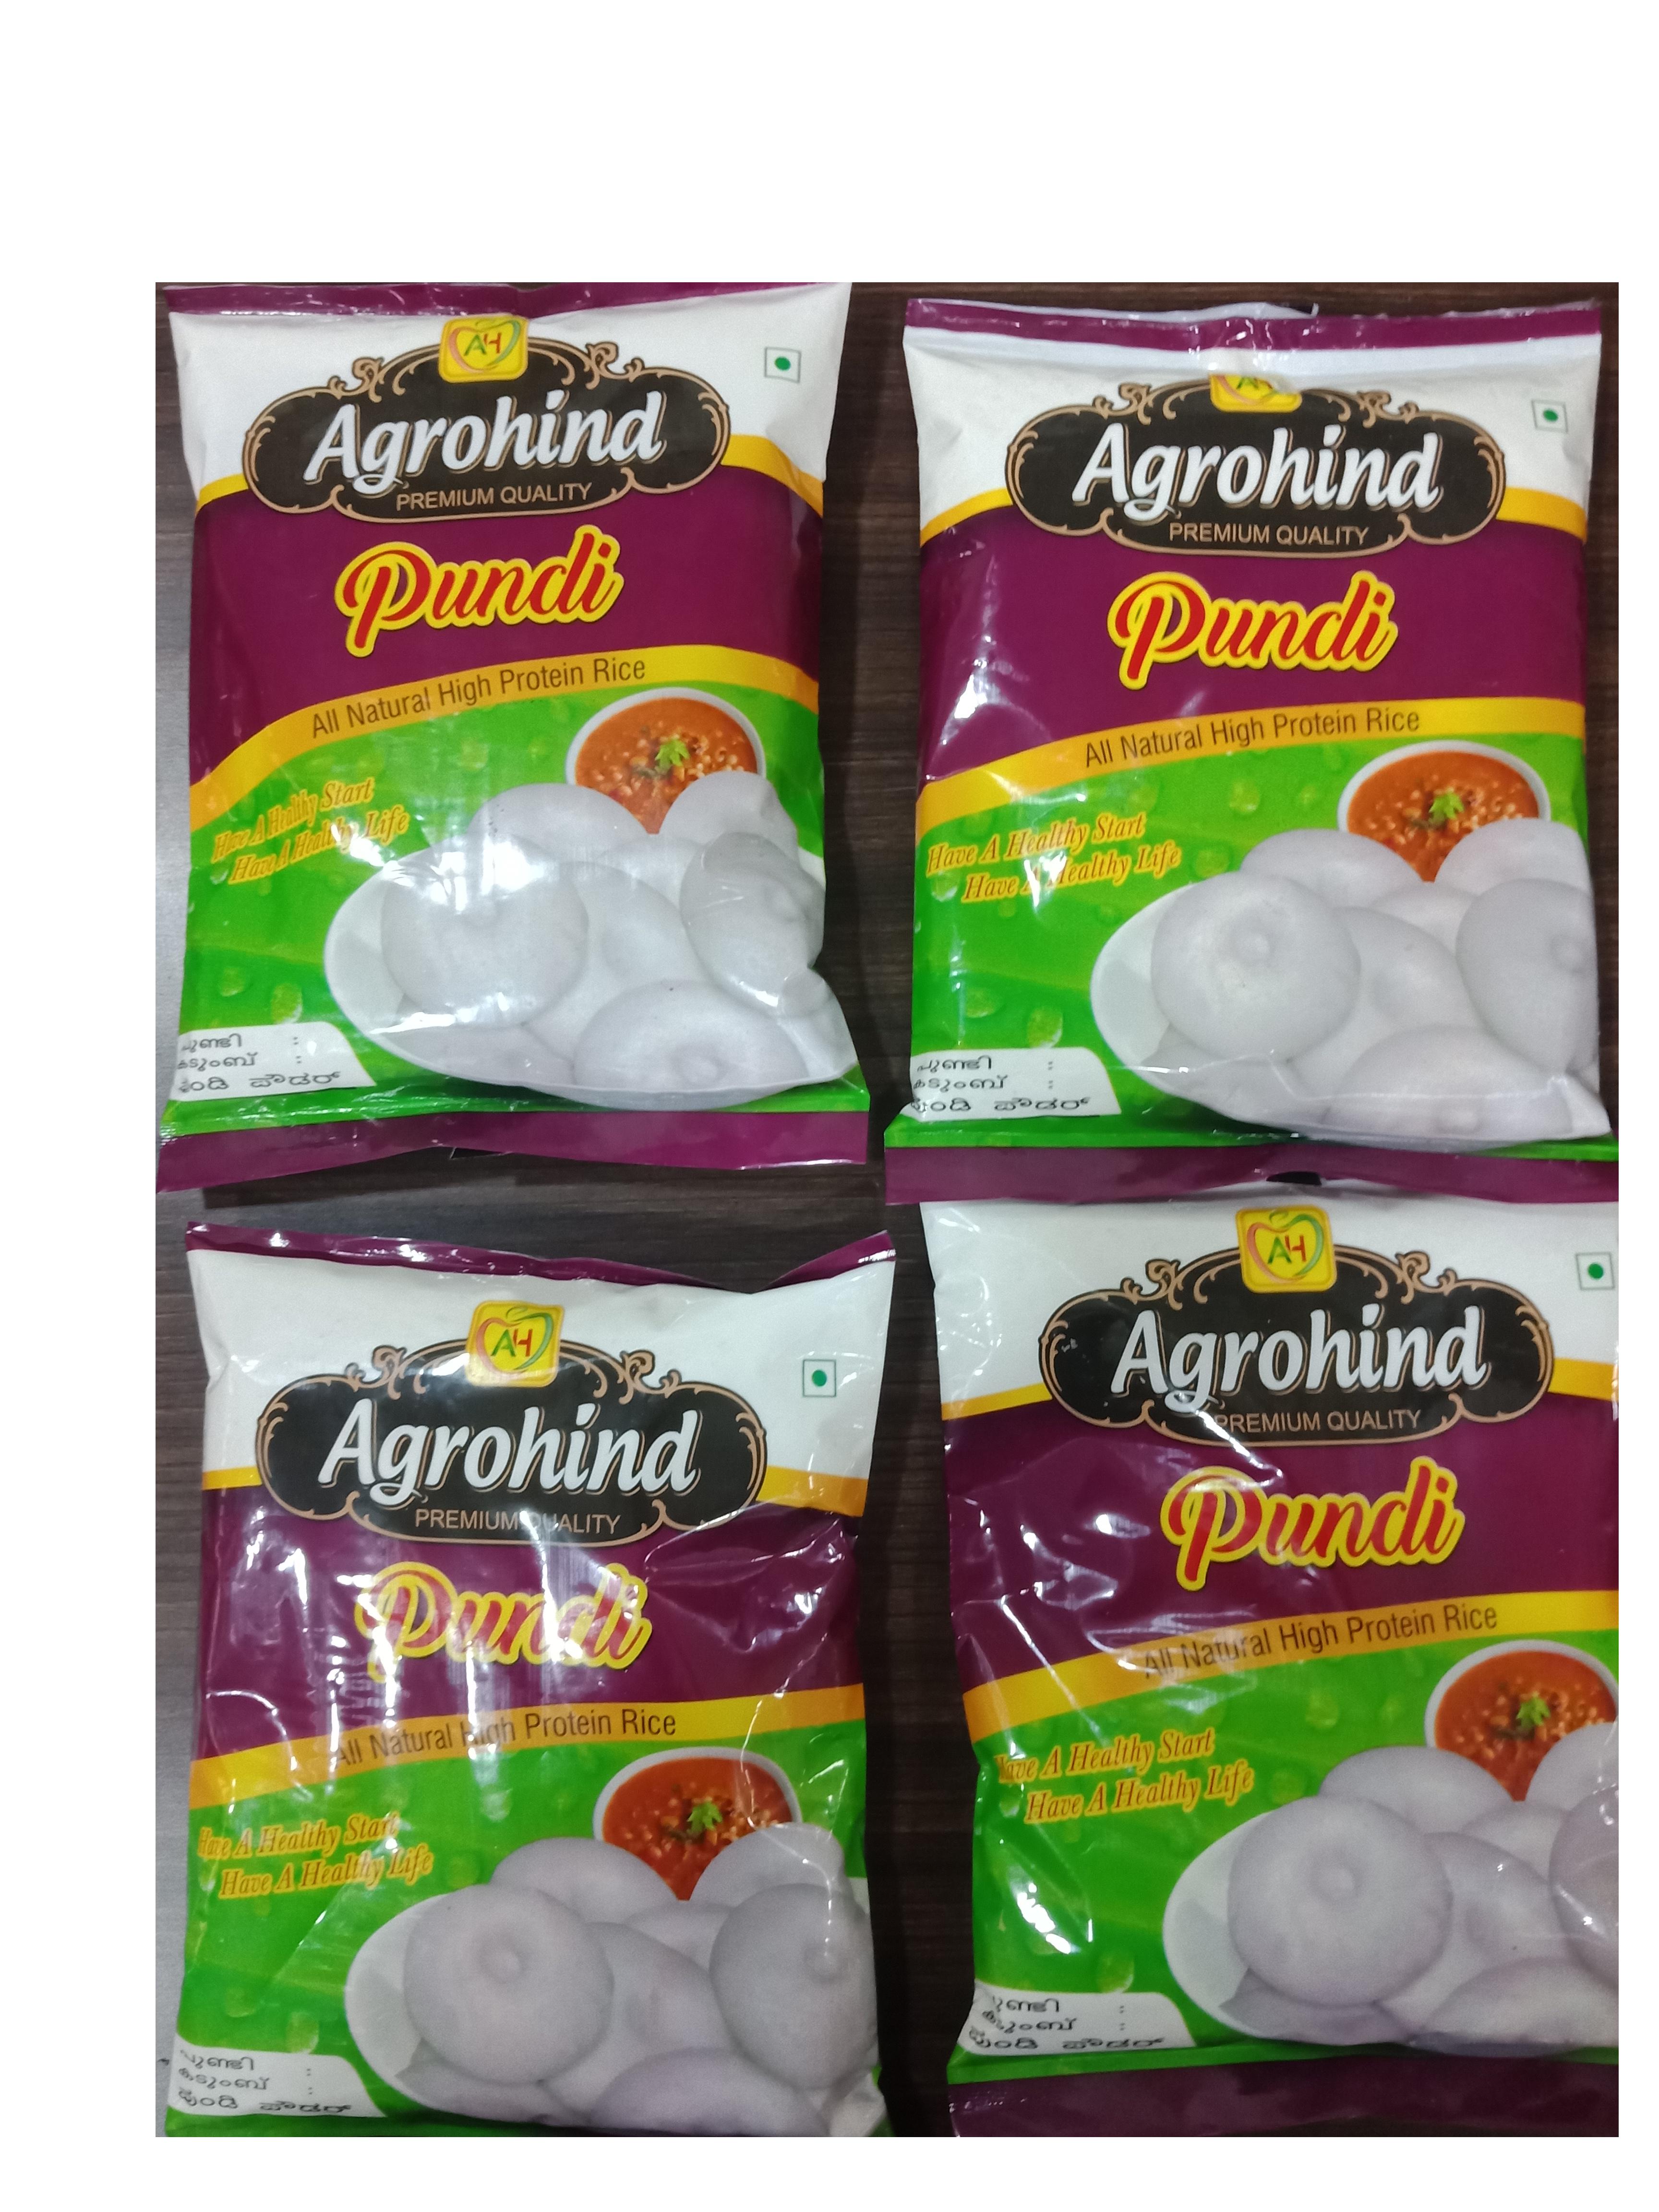 Agrohind Premium Quality Pundi